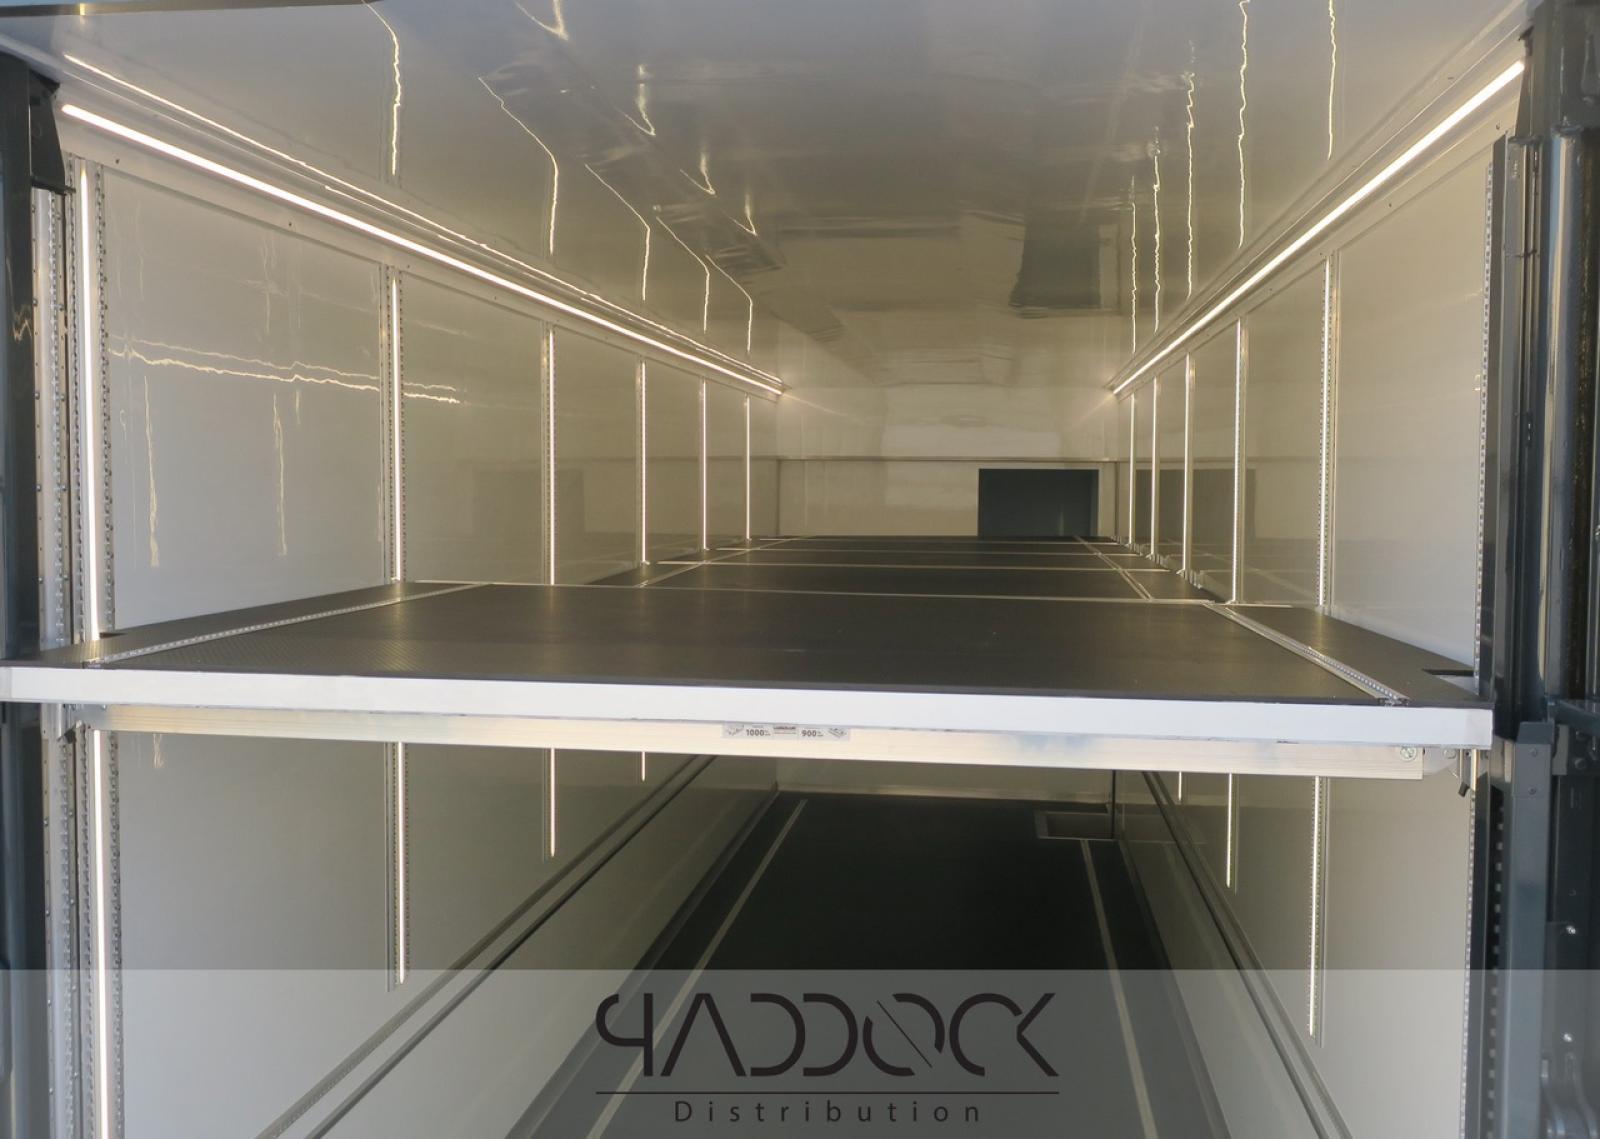 NEW 2020 ASTA CAR TRAILER BY PADDOCK DISTRIBUTION - 5